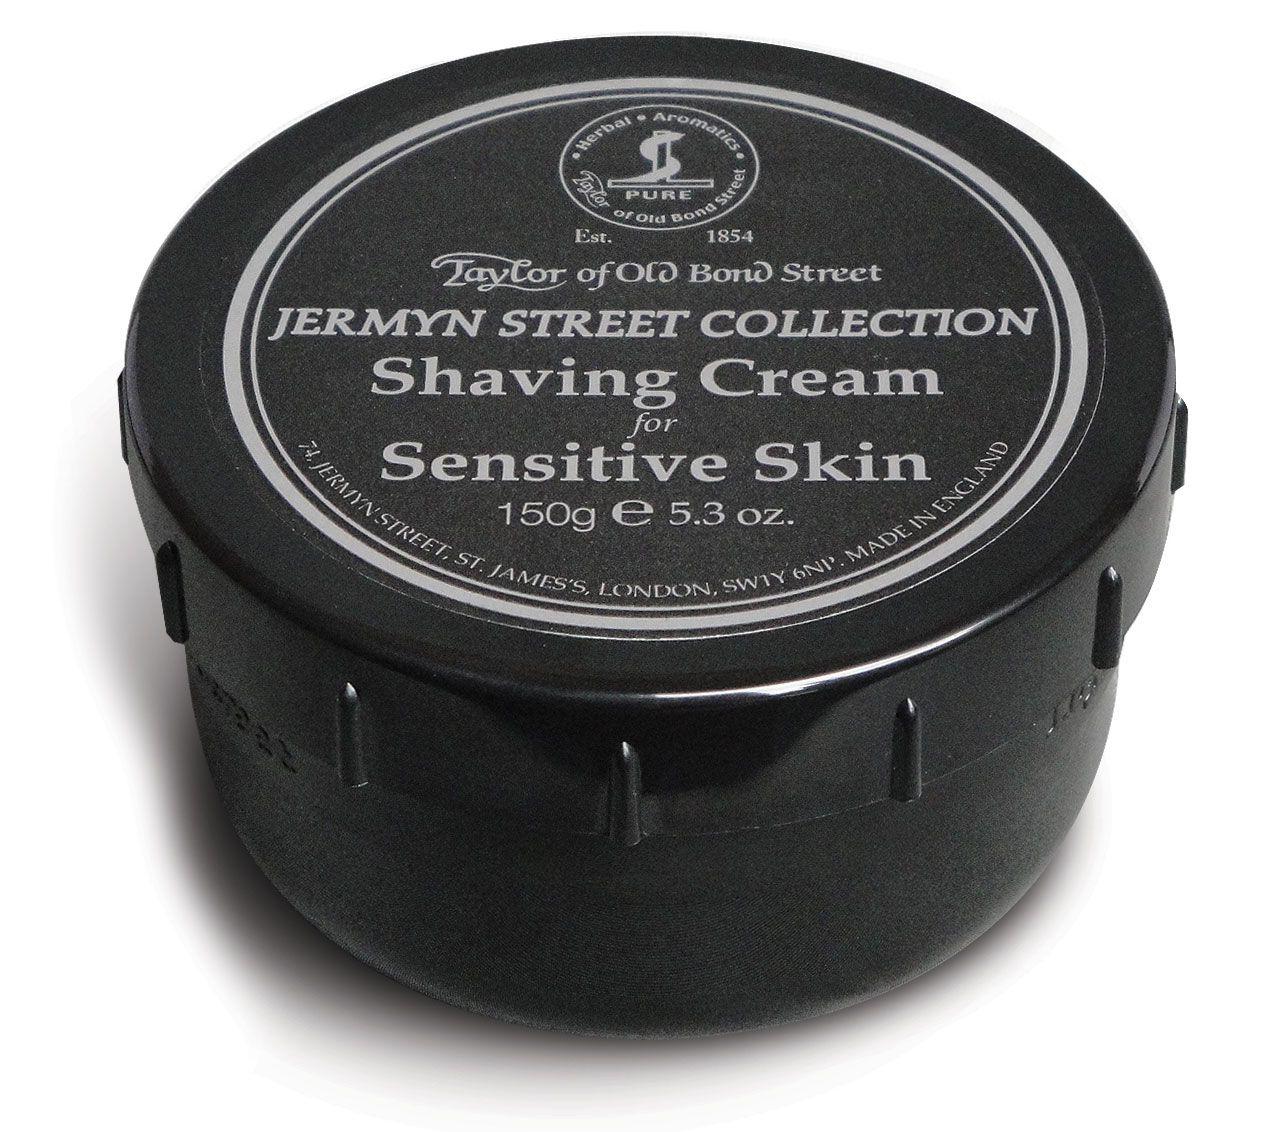 Taylor of Old Bond Street Jermyn Street Collection Shaving Cream for Sensitive Skin 5.3 oz (150g)